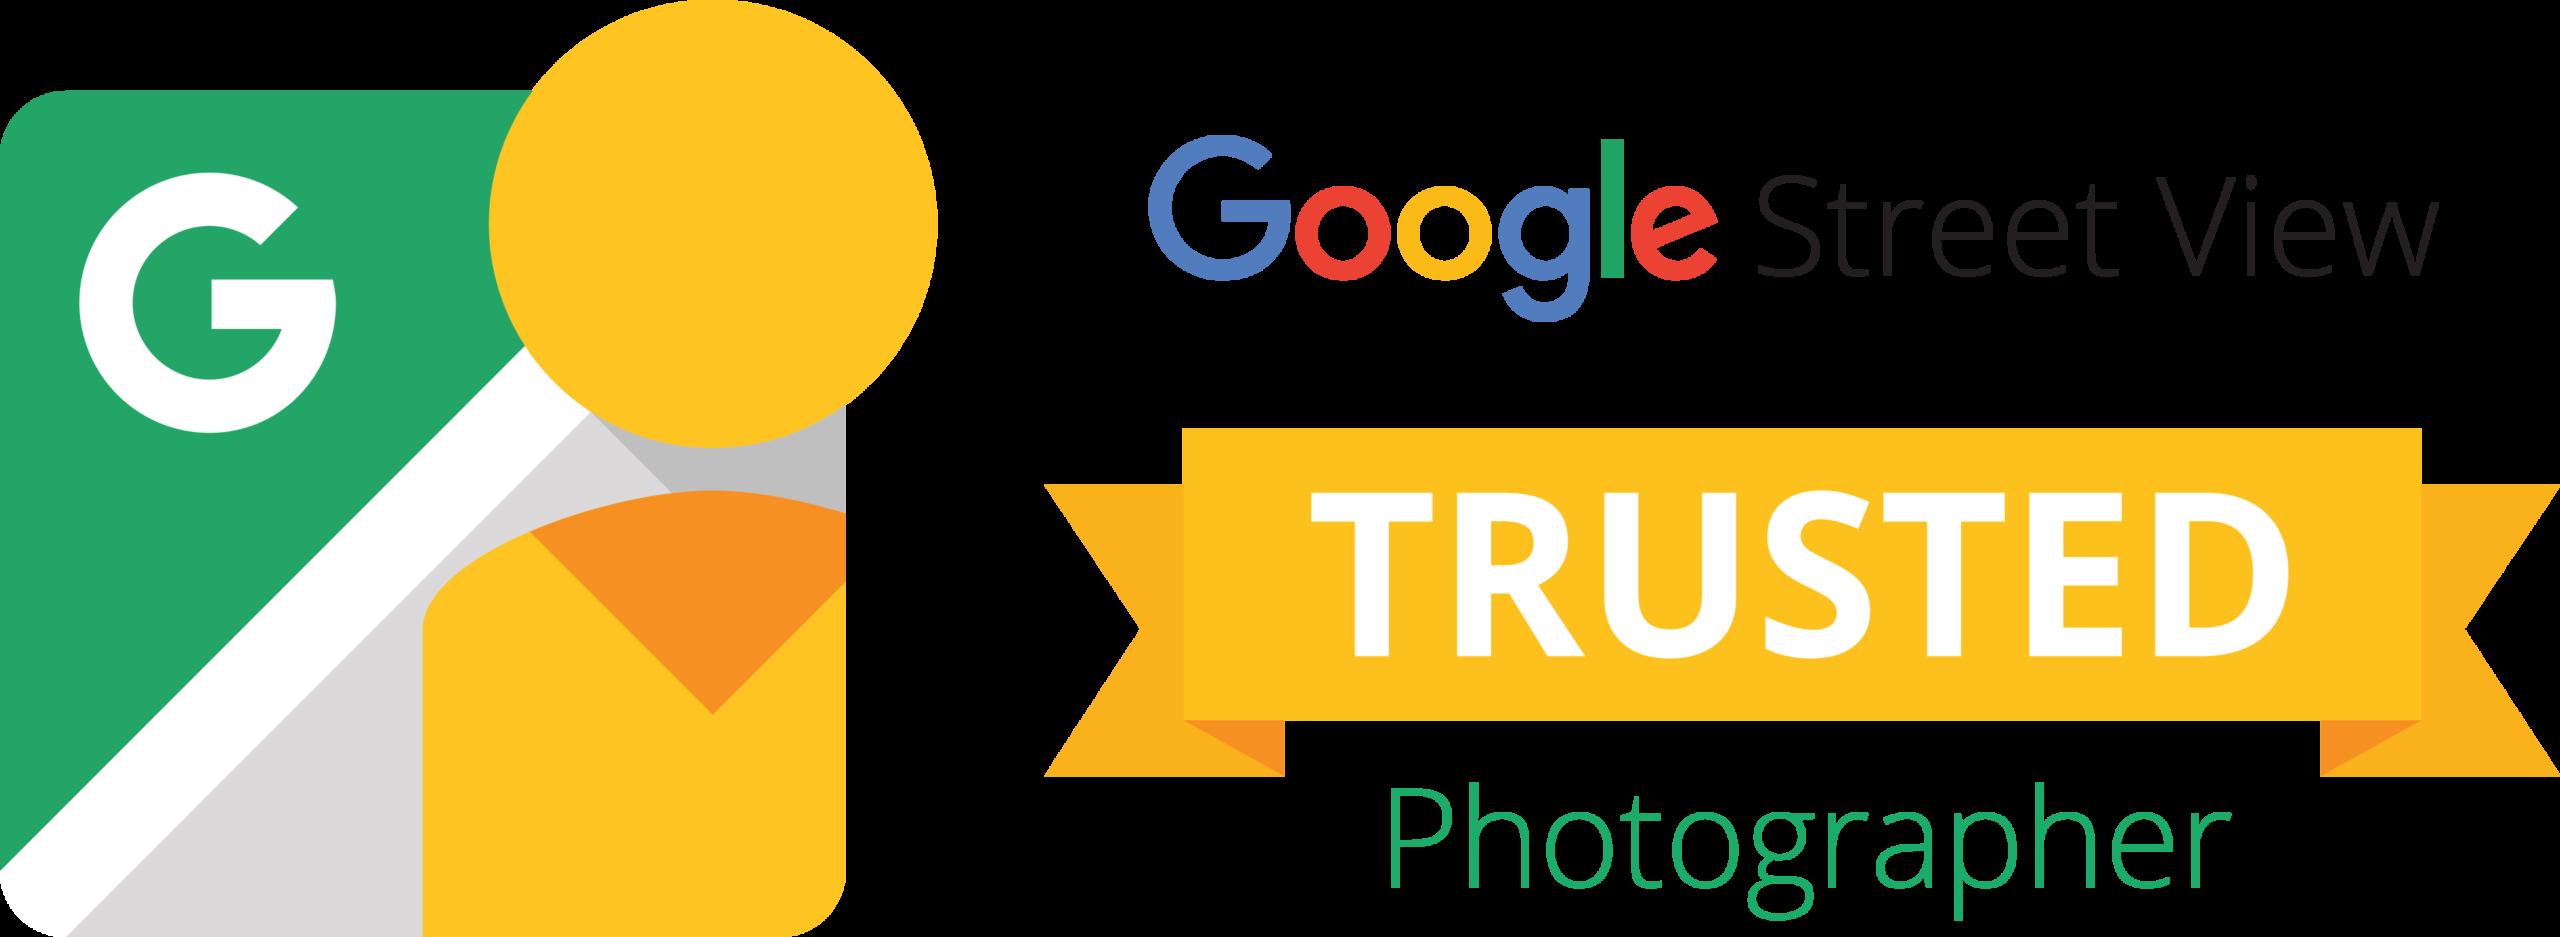 Google streew View